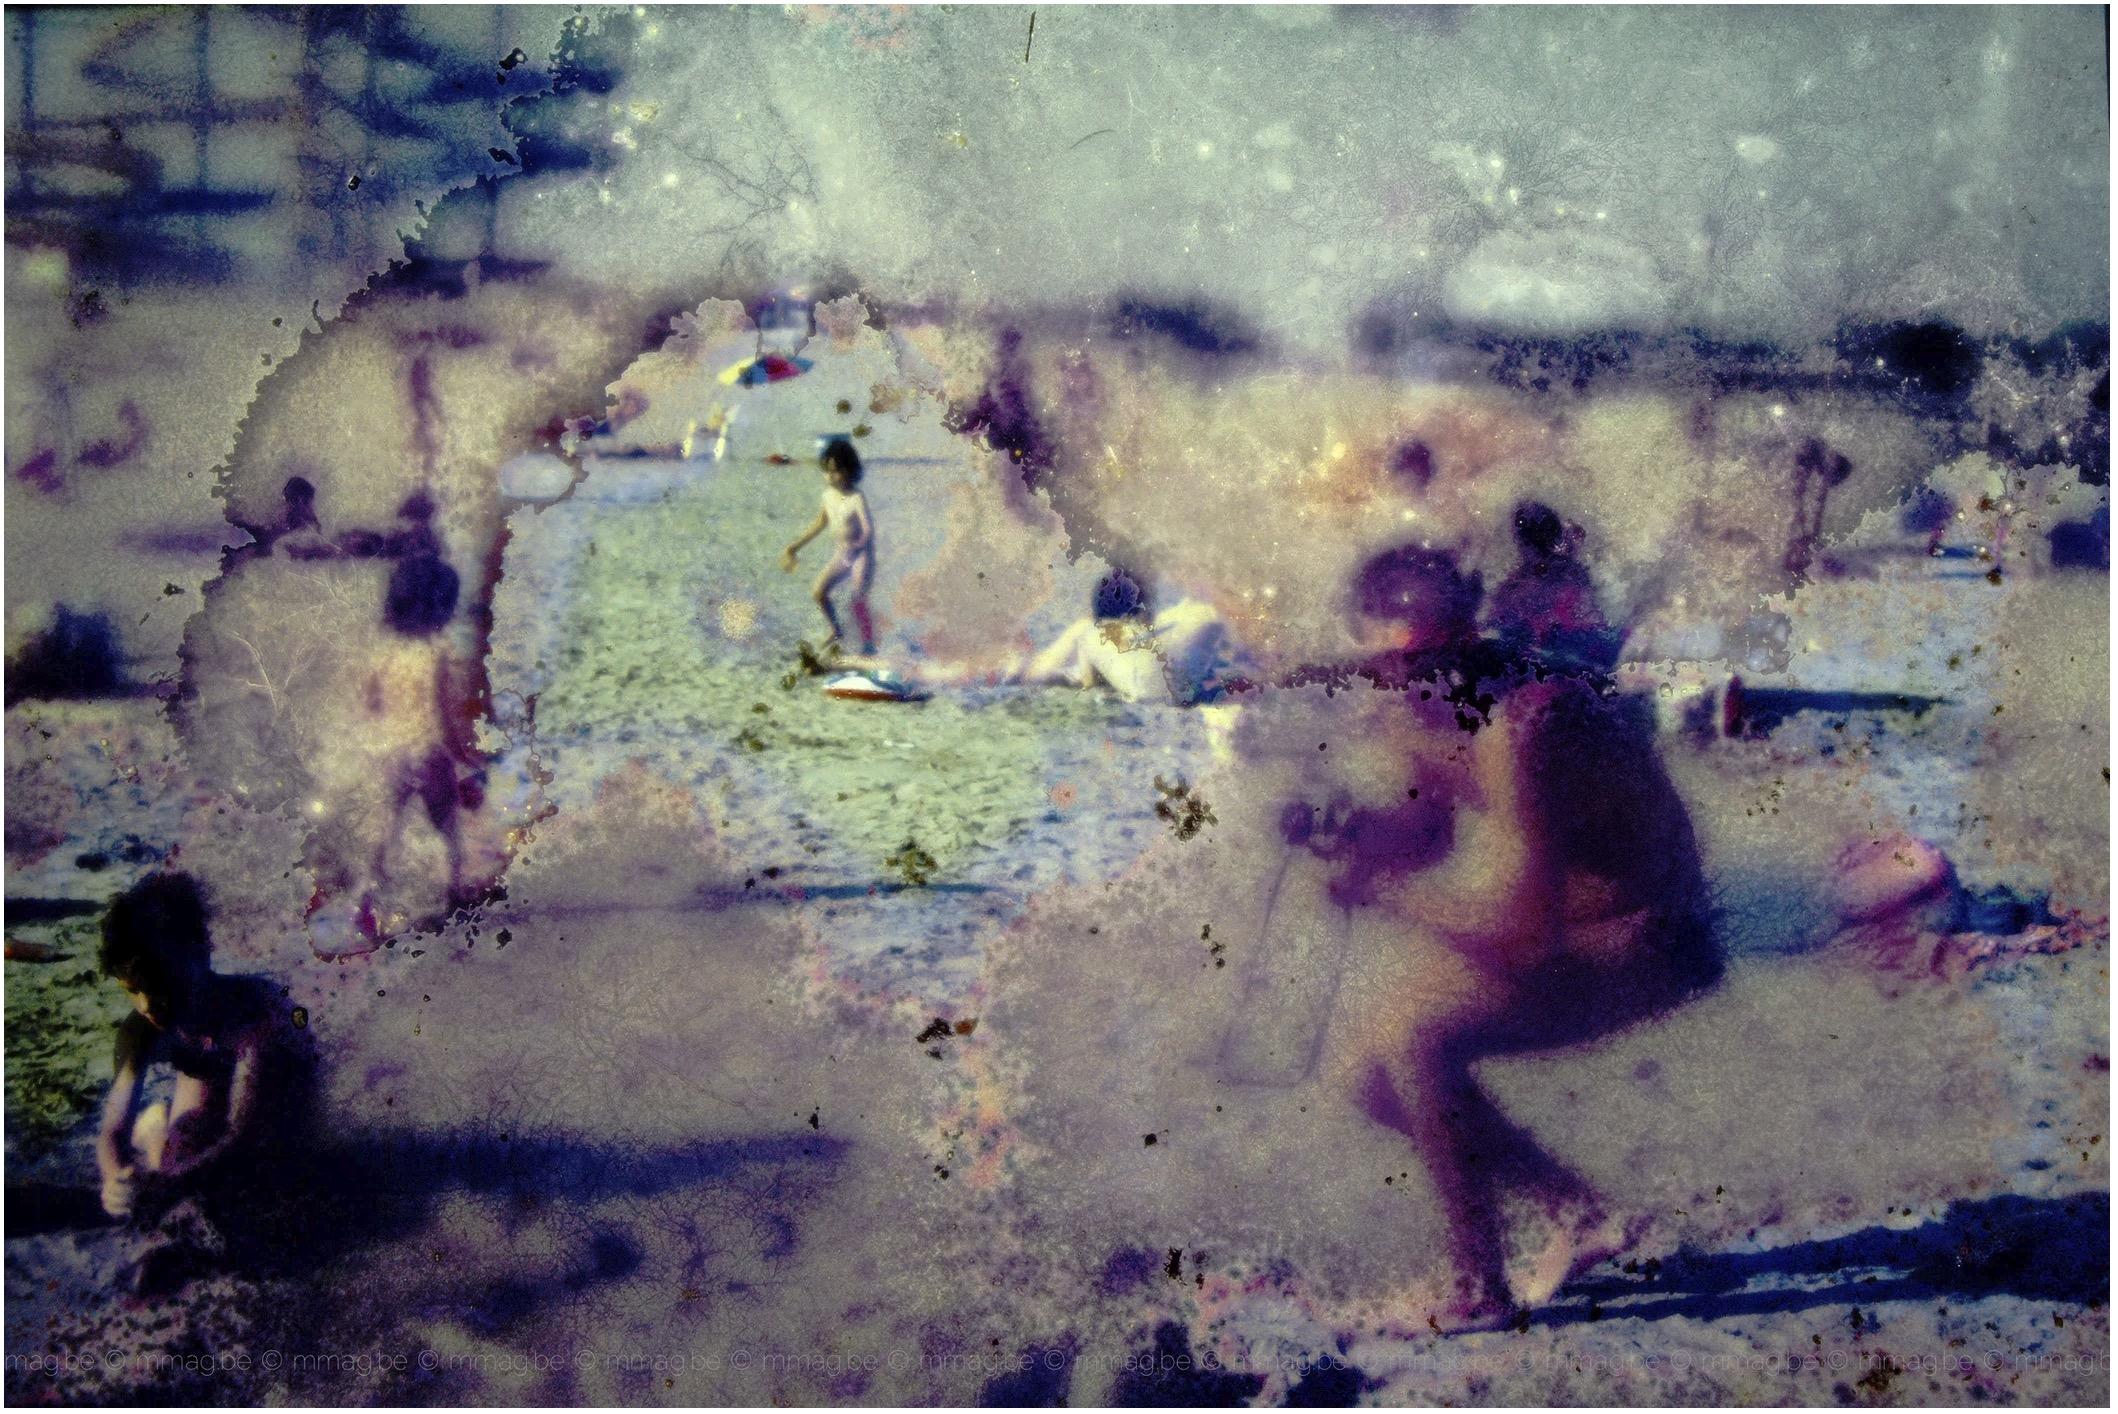 Michel Mangon expose sa série Souvenance.